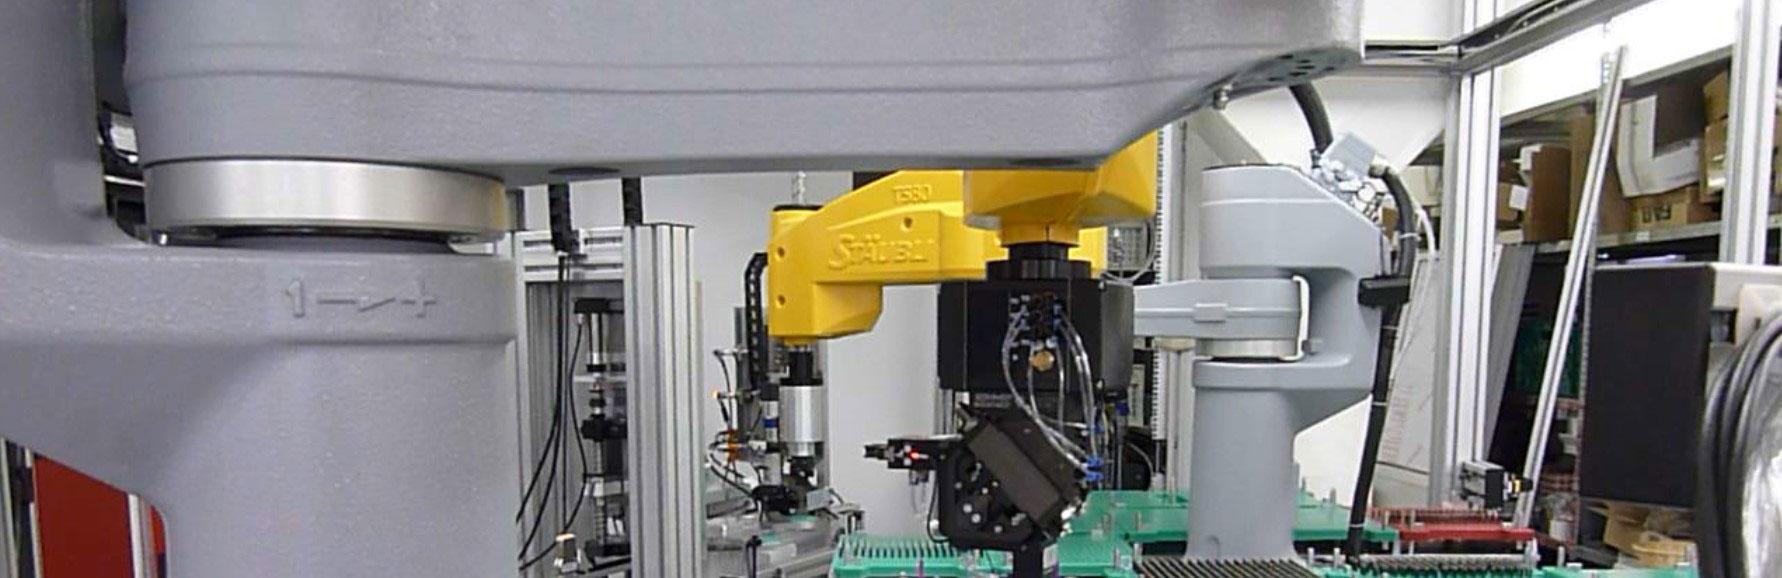 SPS Roboter